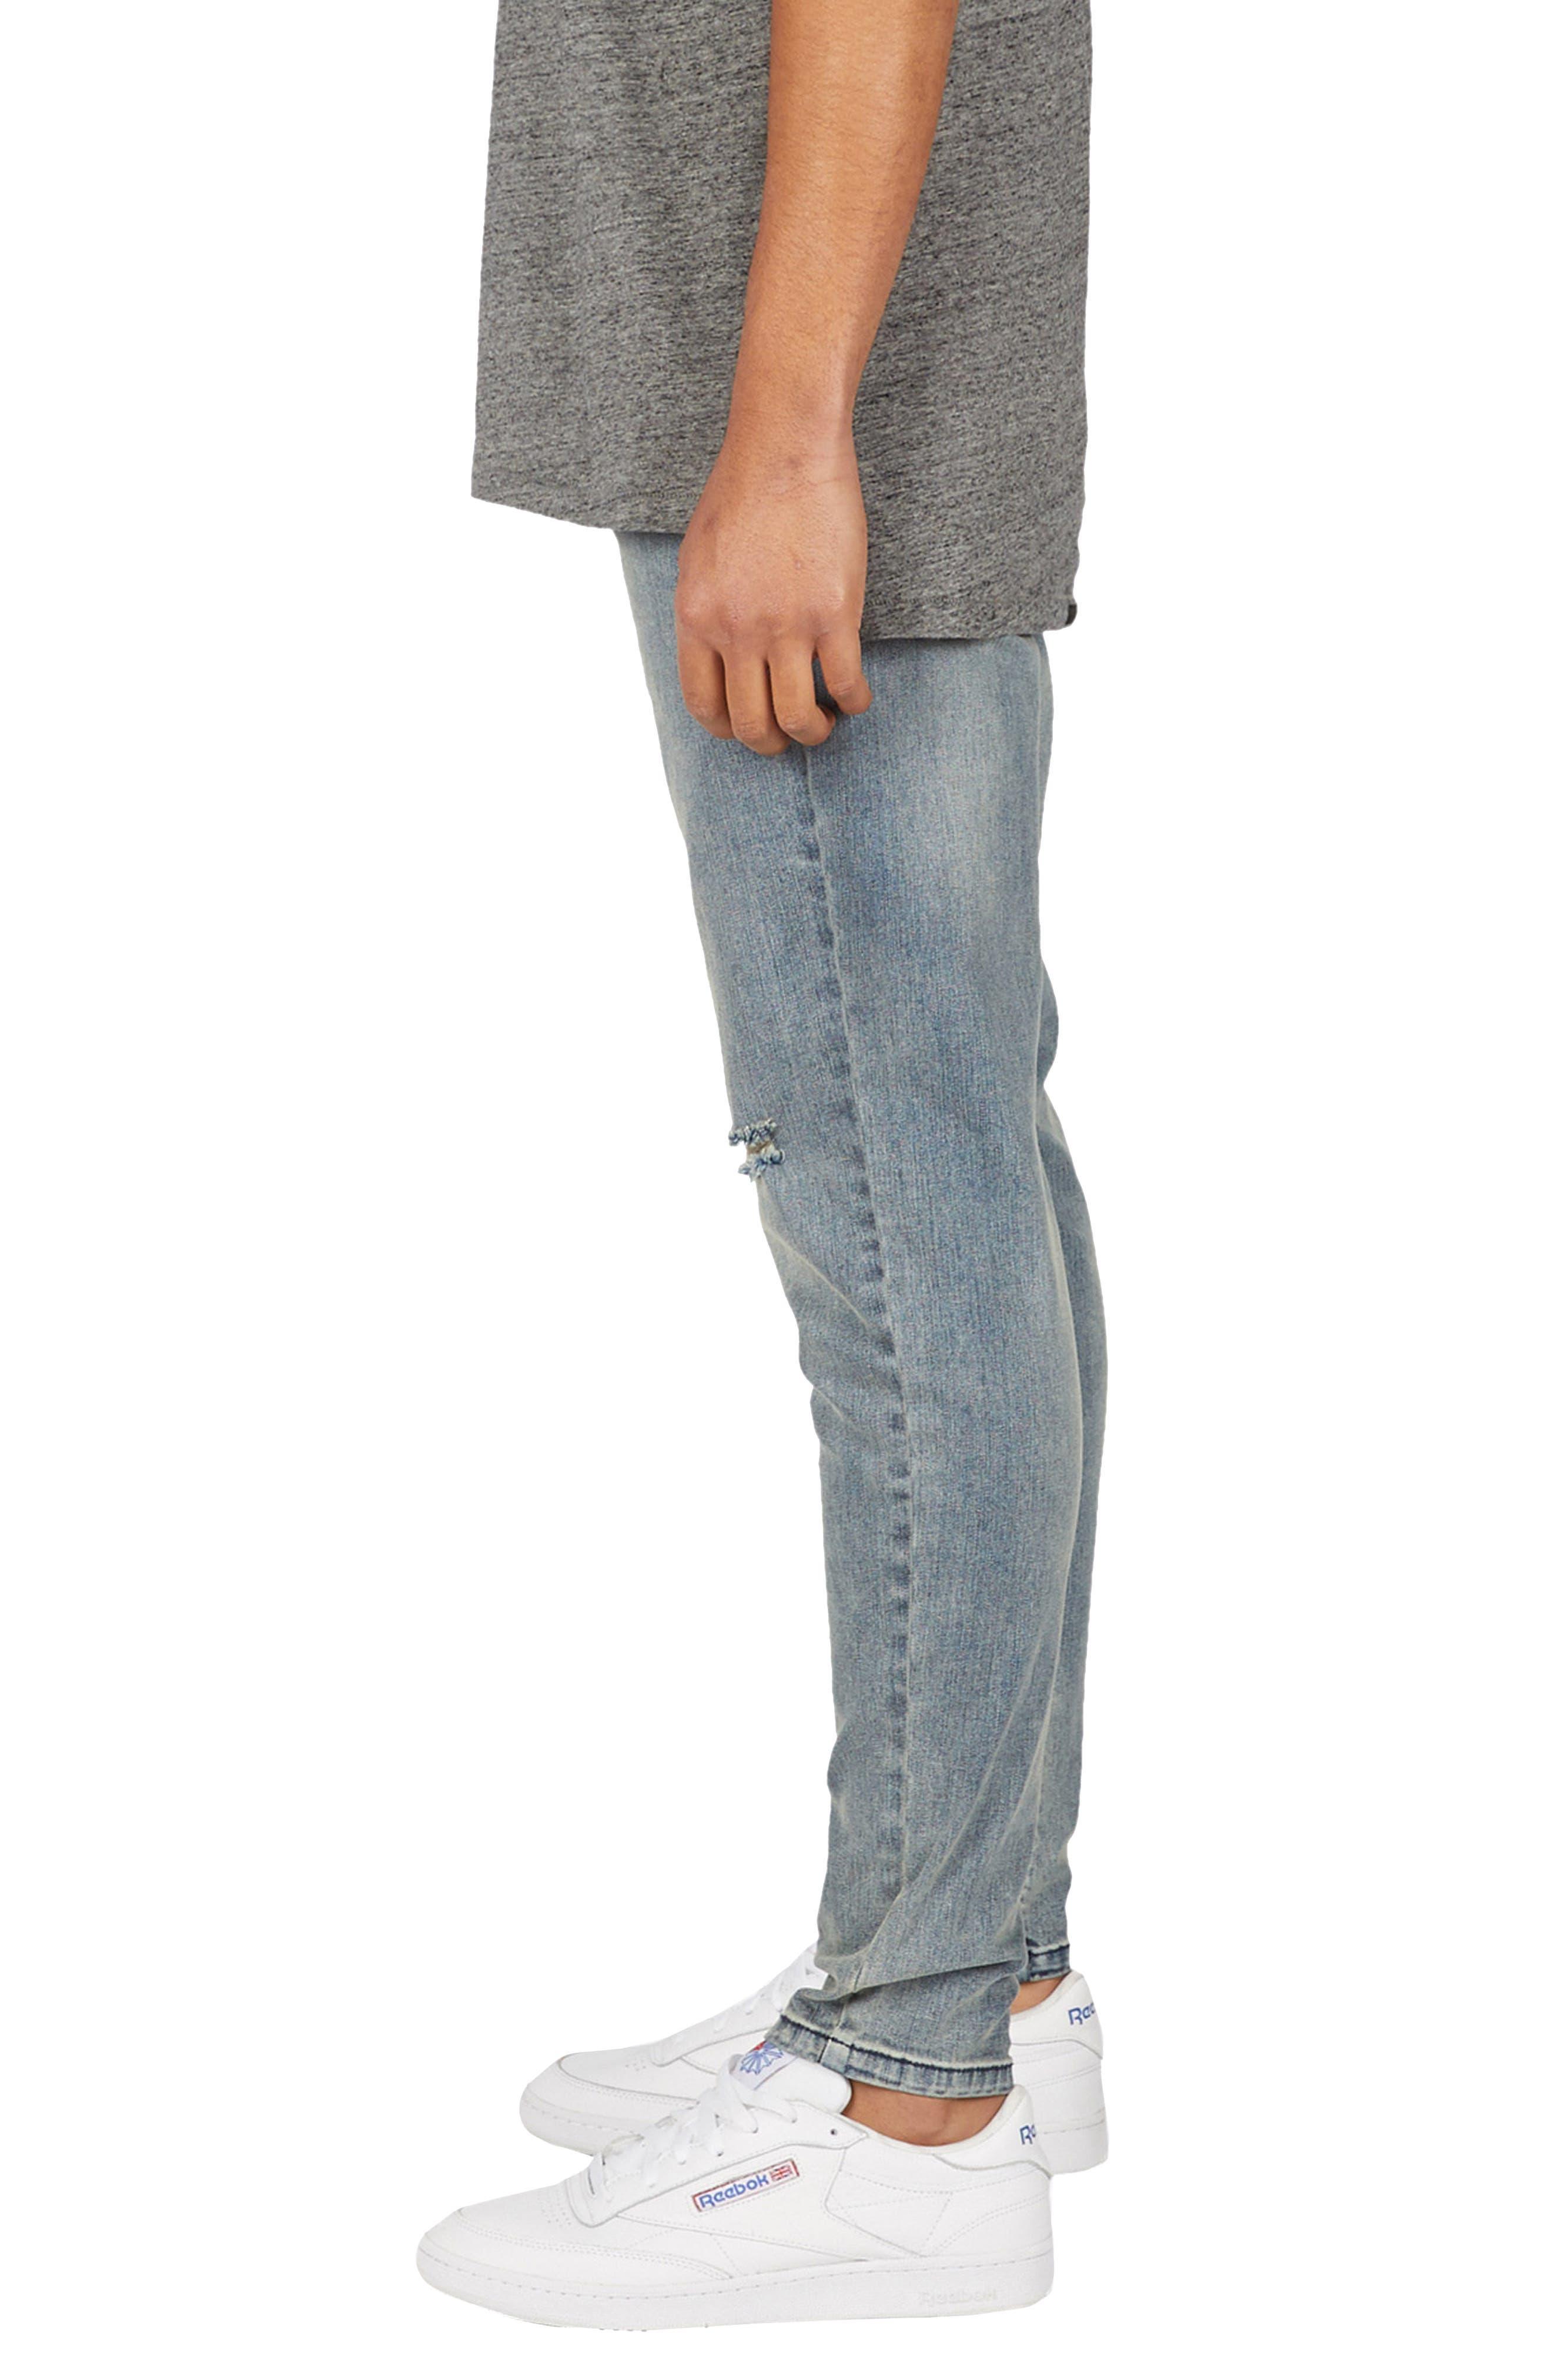 Sharpshot Slouchy Slim Fit Jeans,                             Alternate thumbnail 3, color,